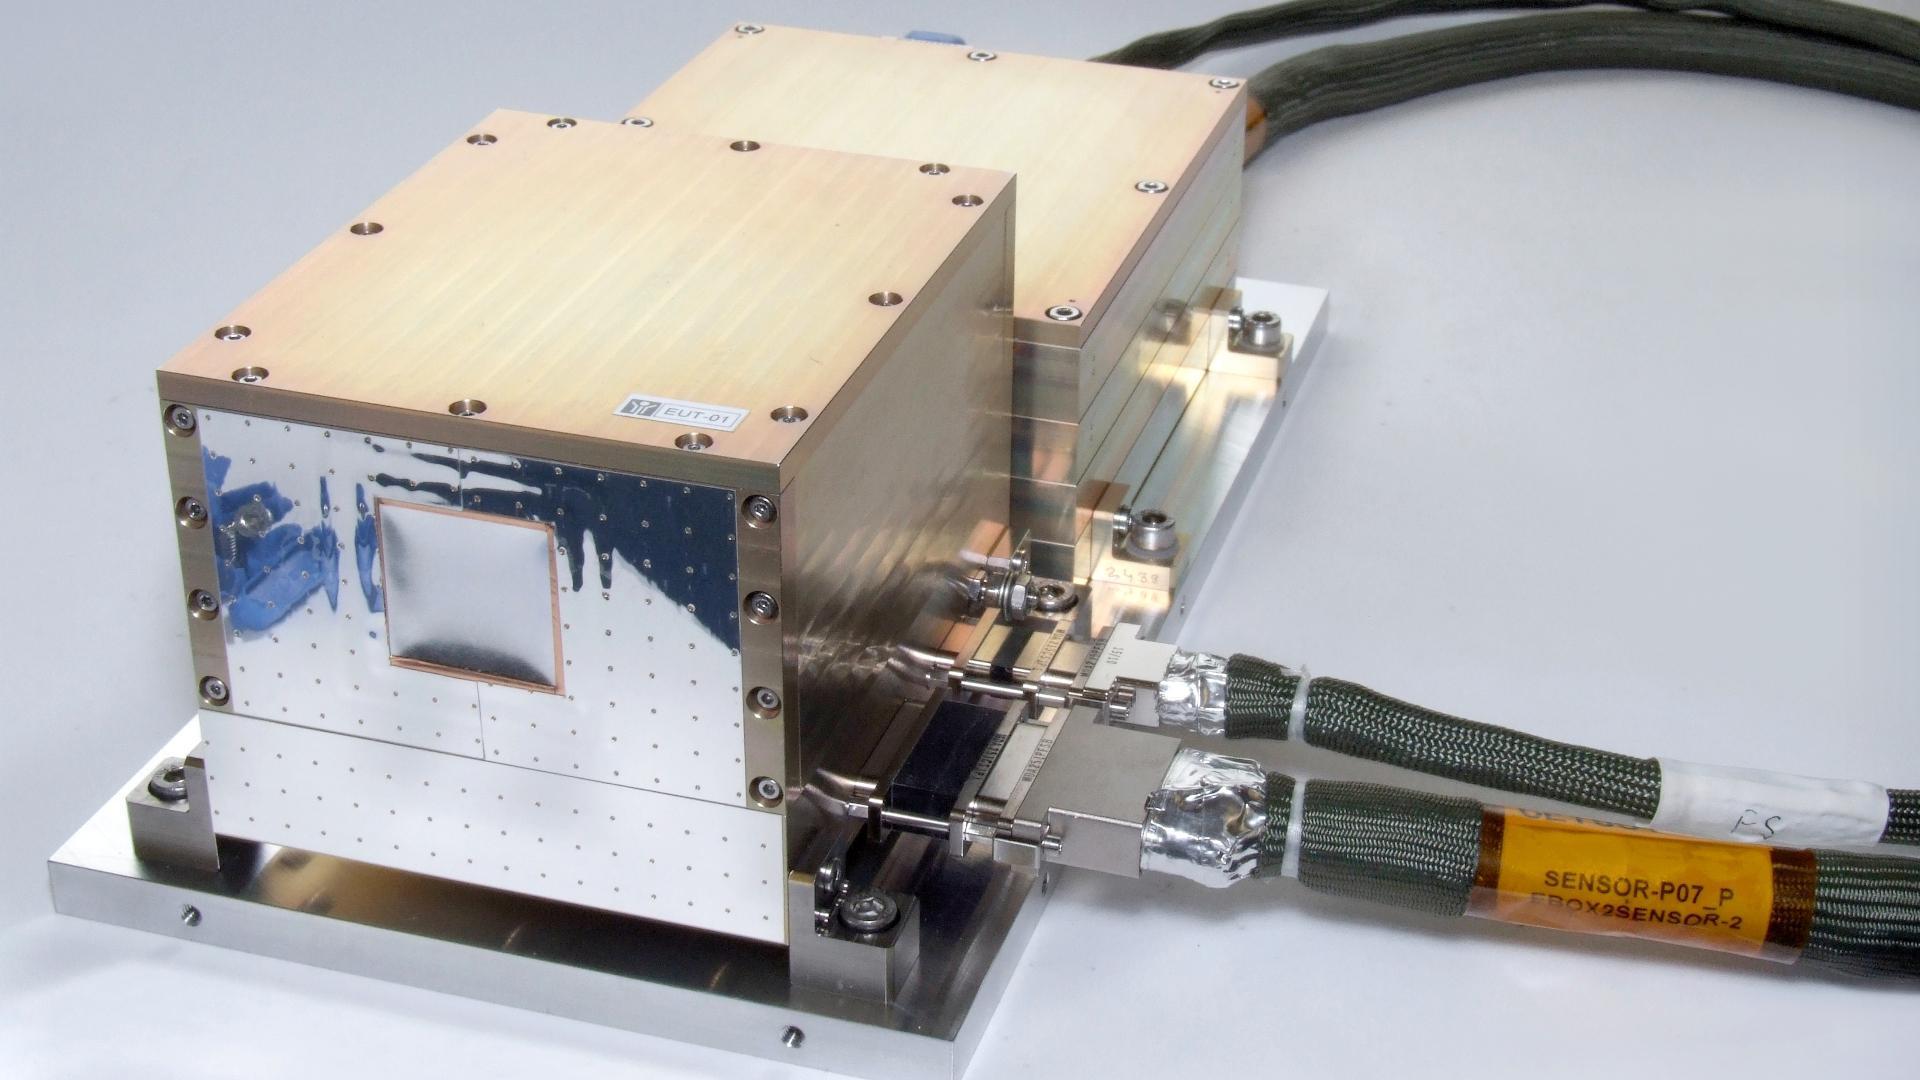 Lunar Lander Neutron and Dosimetry (LND) Luna Radiazioni